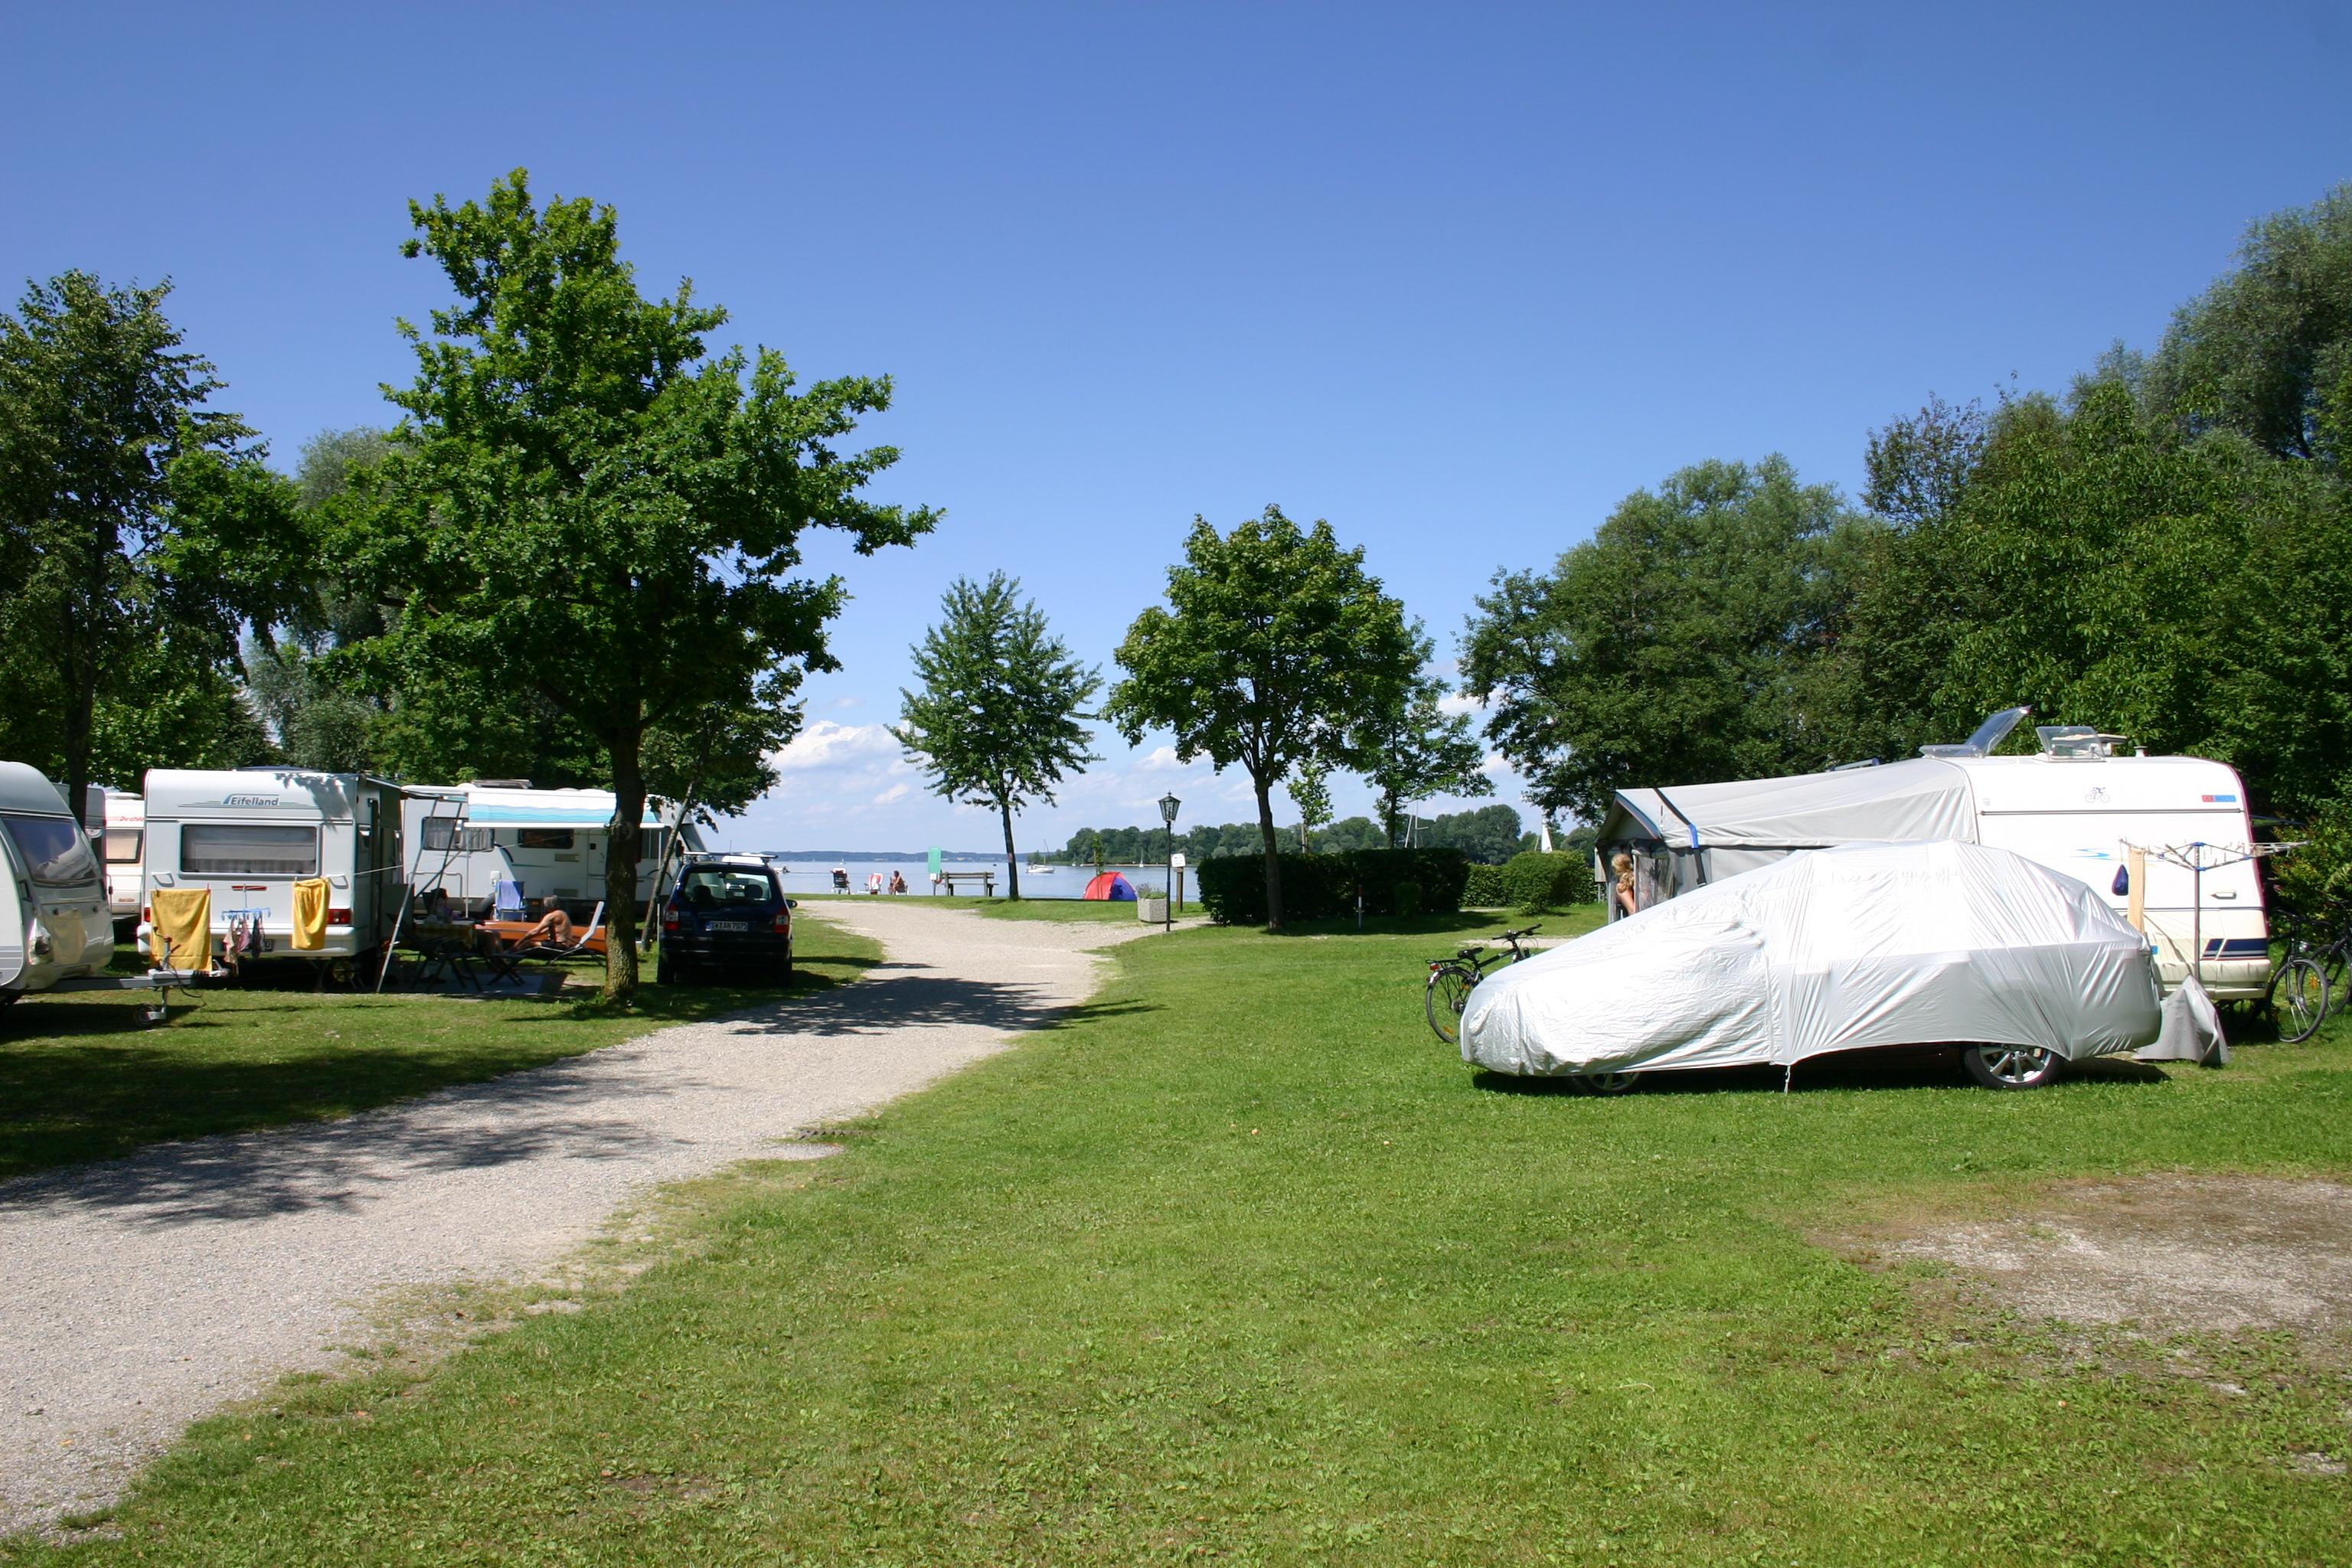 stellpl tze stellpl tze camping informieren chiemsee camping r dlgries chiemgau bayern. Black Bedroom Furniture Sets. Home Design Ideas